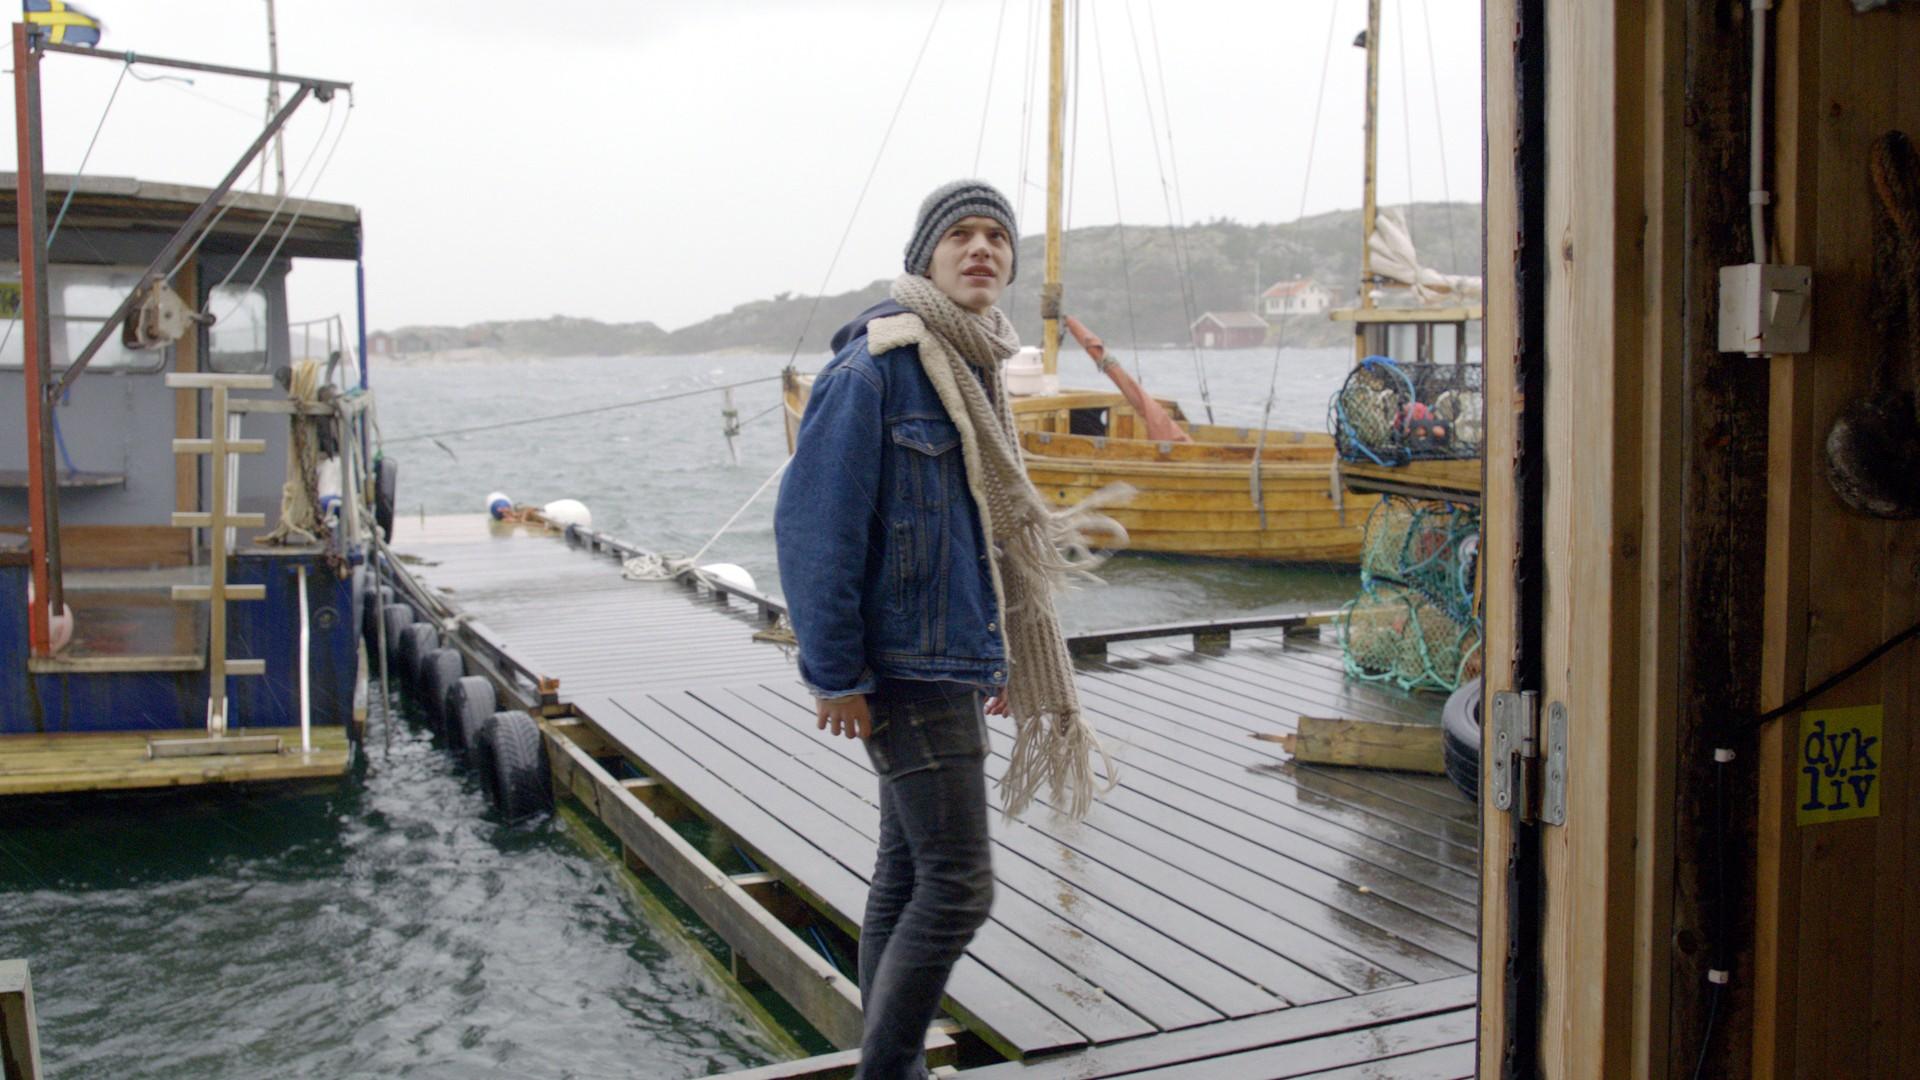 Umorstva u Fjällbacki 3: Vitezovi mora